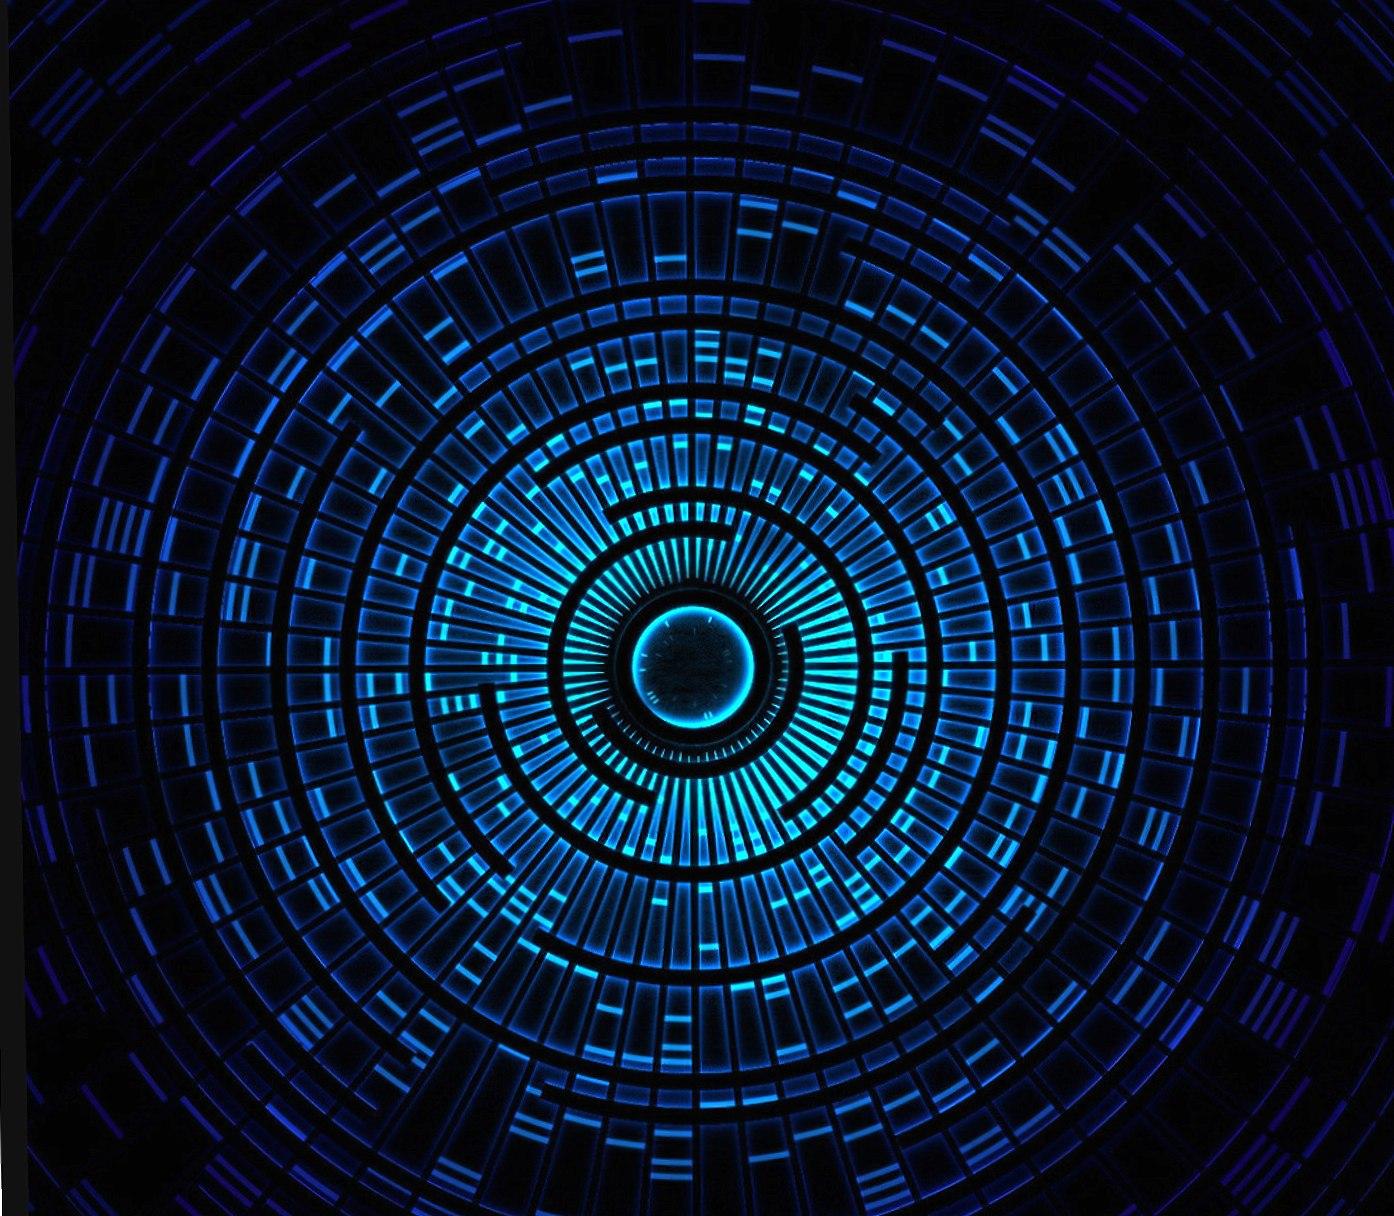 Tech Black Hole wallpapers HD quality